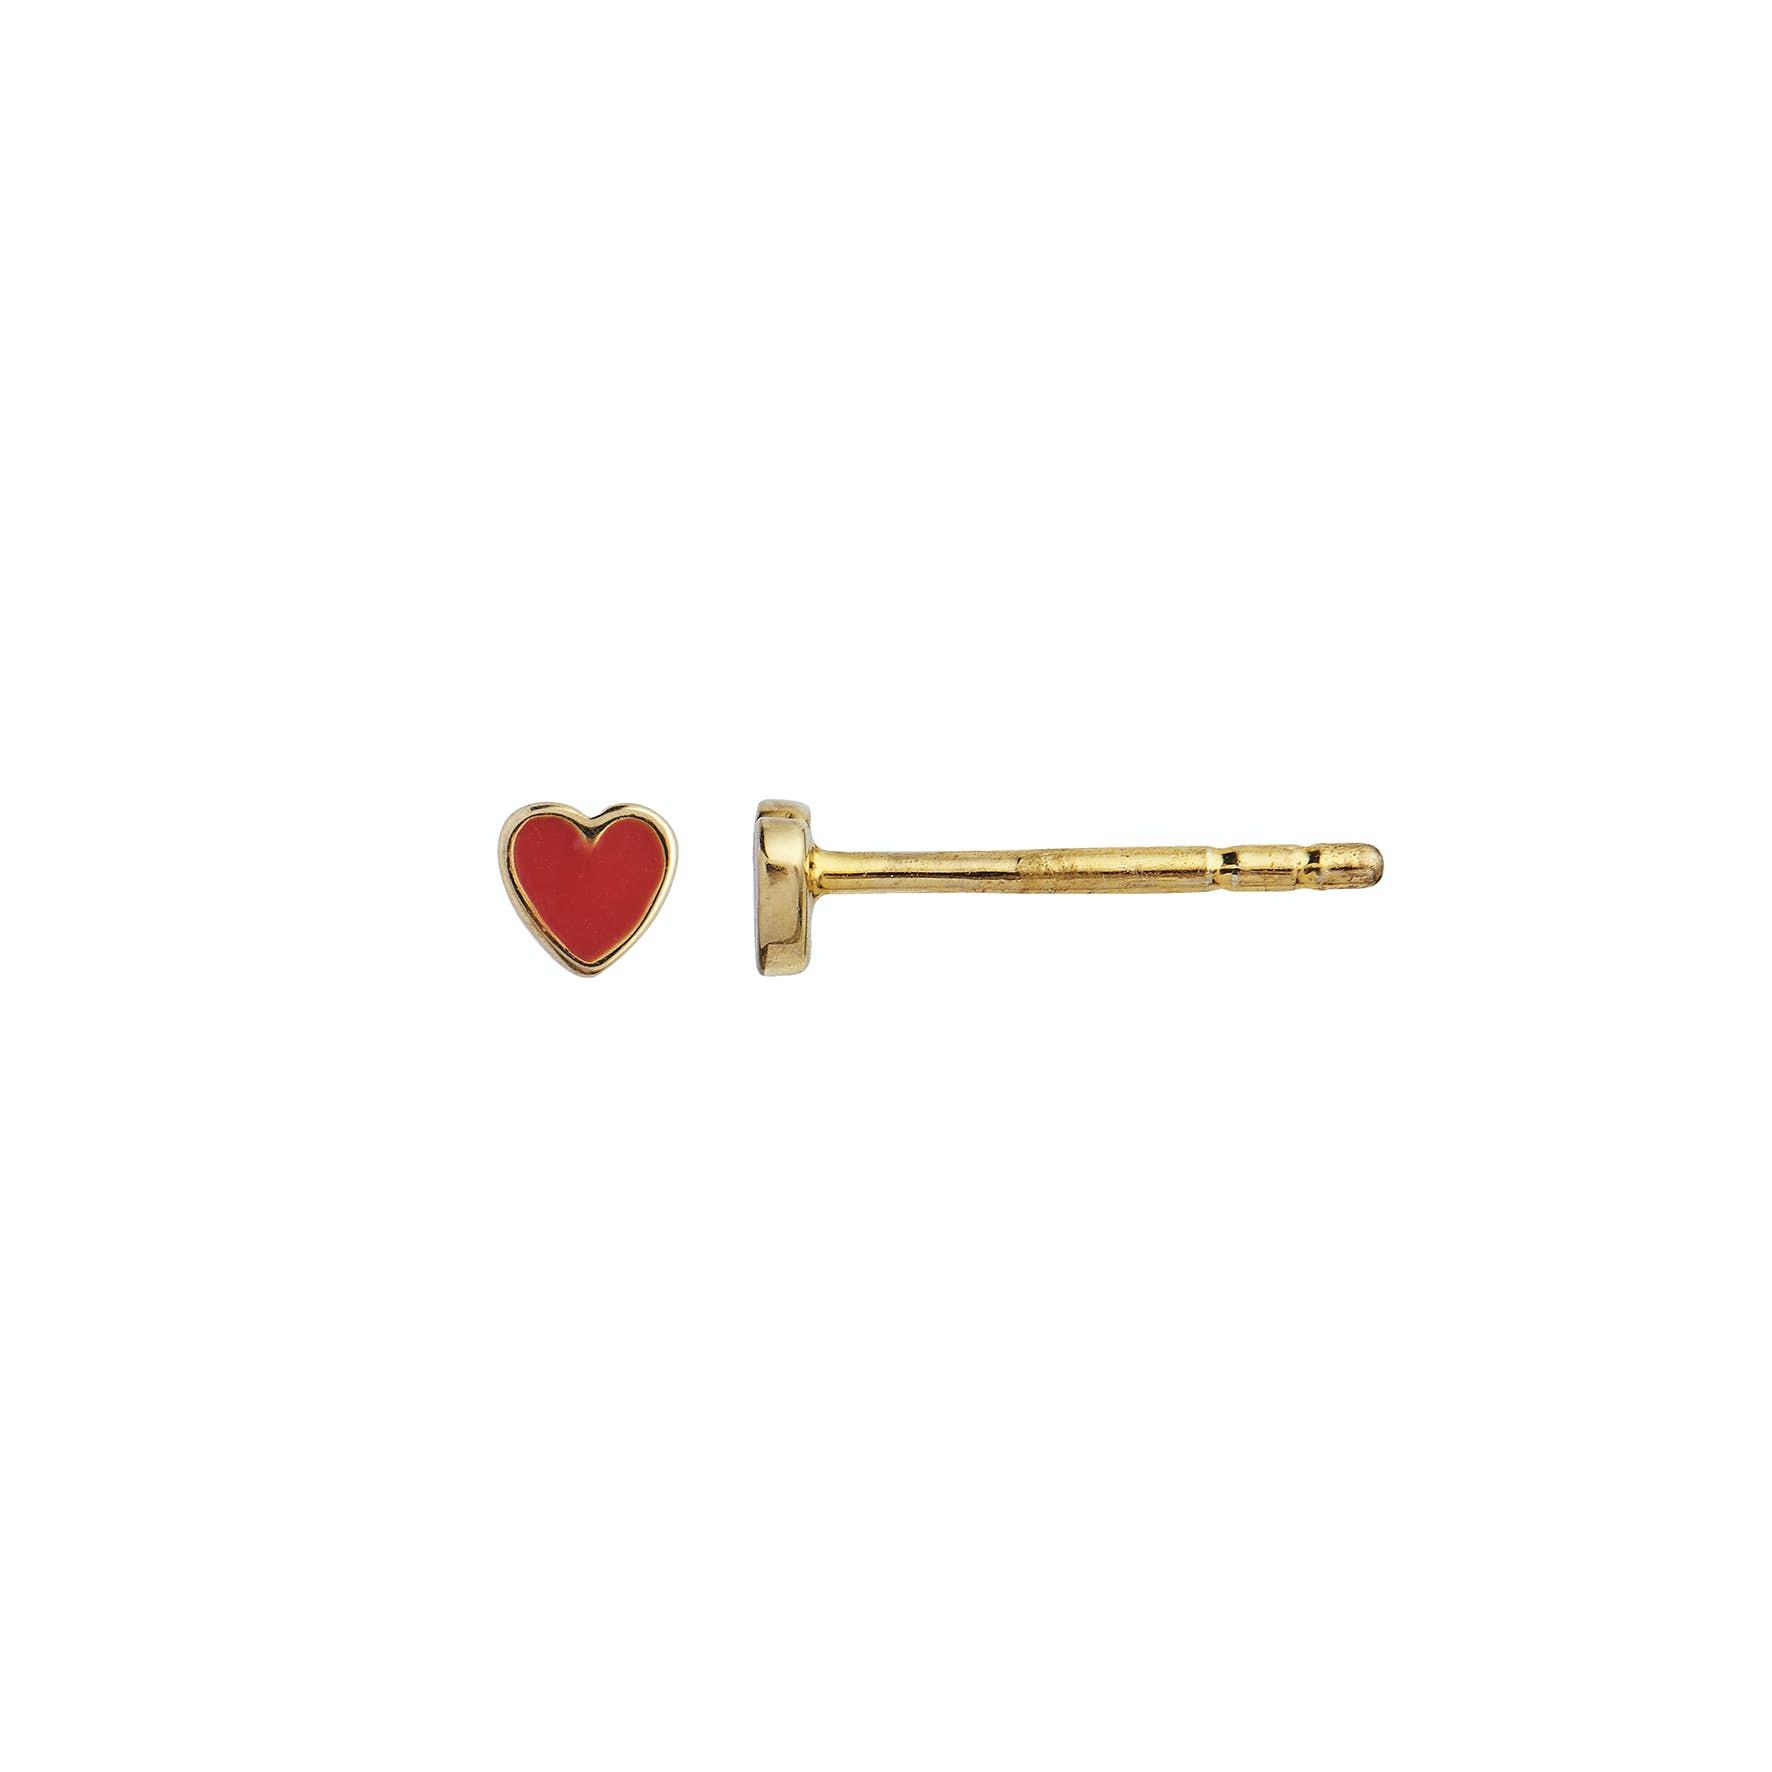 Petit Love Heart Earstick Red Coral fra STINE A Jewelry i Forgylt-Sølv Sterling 925